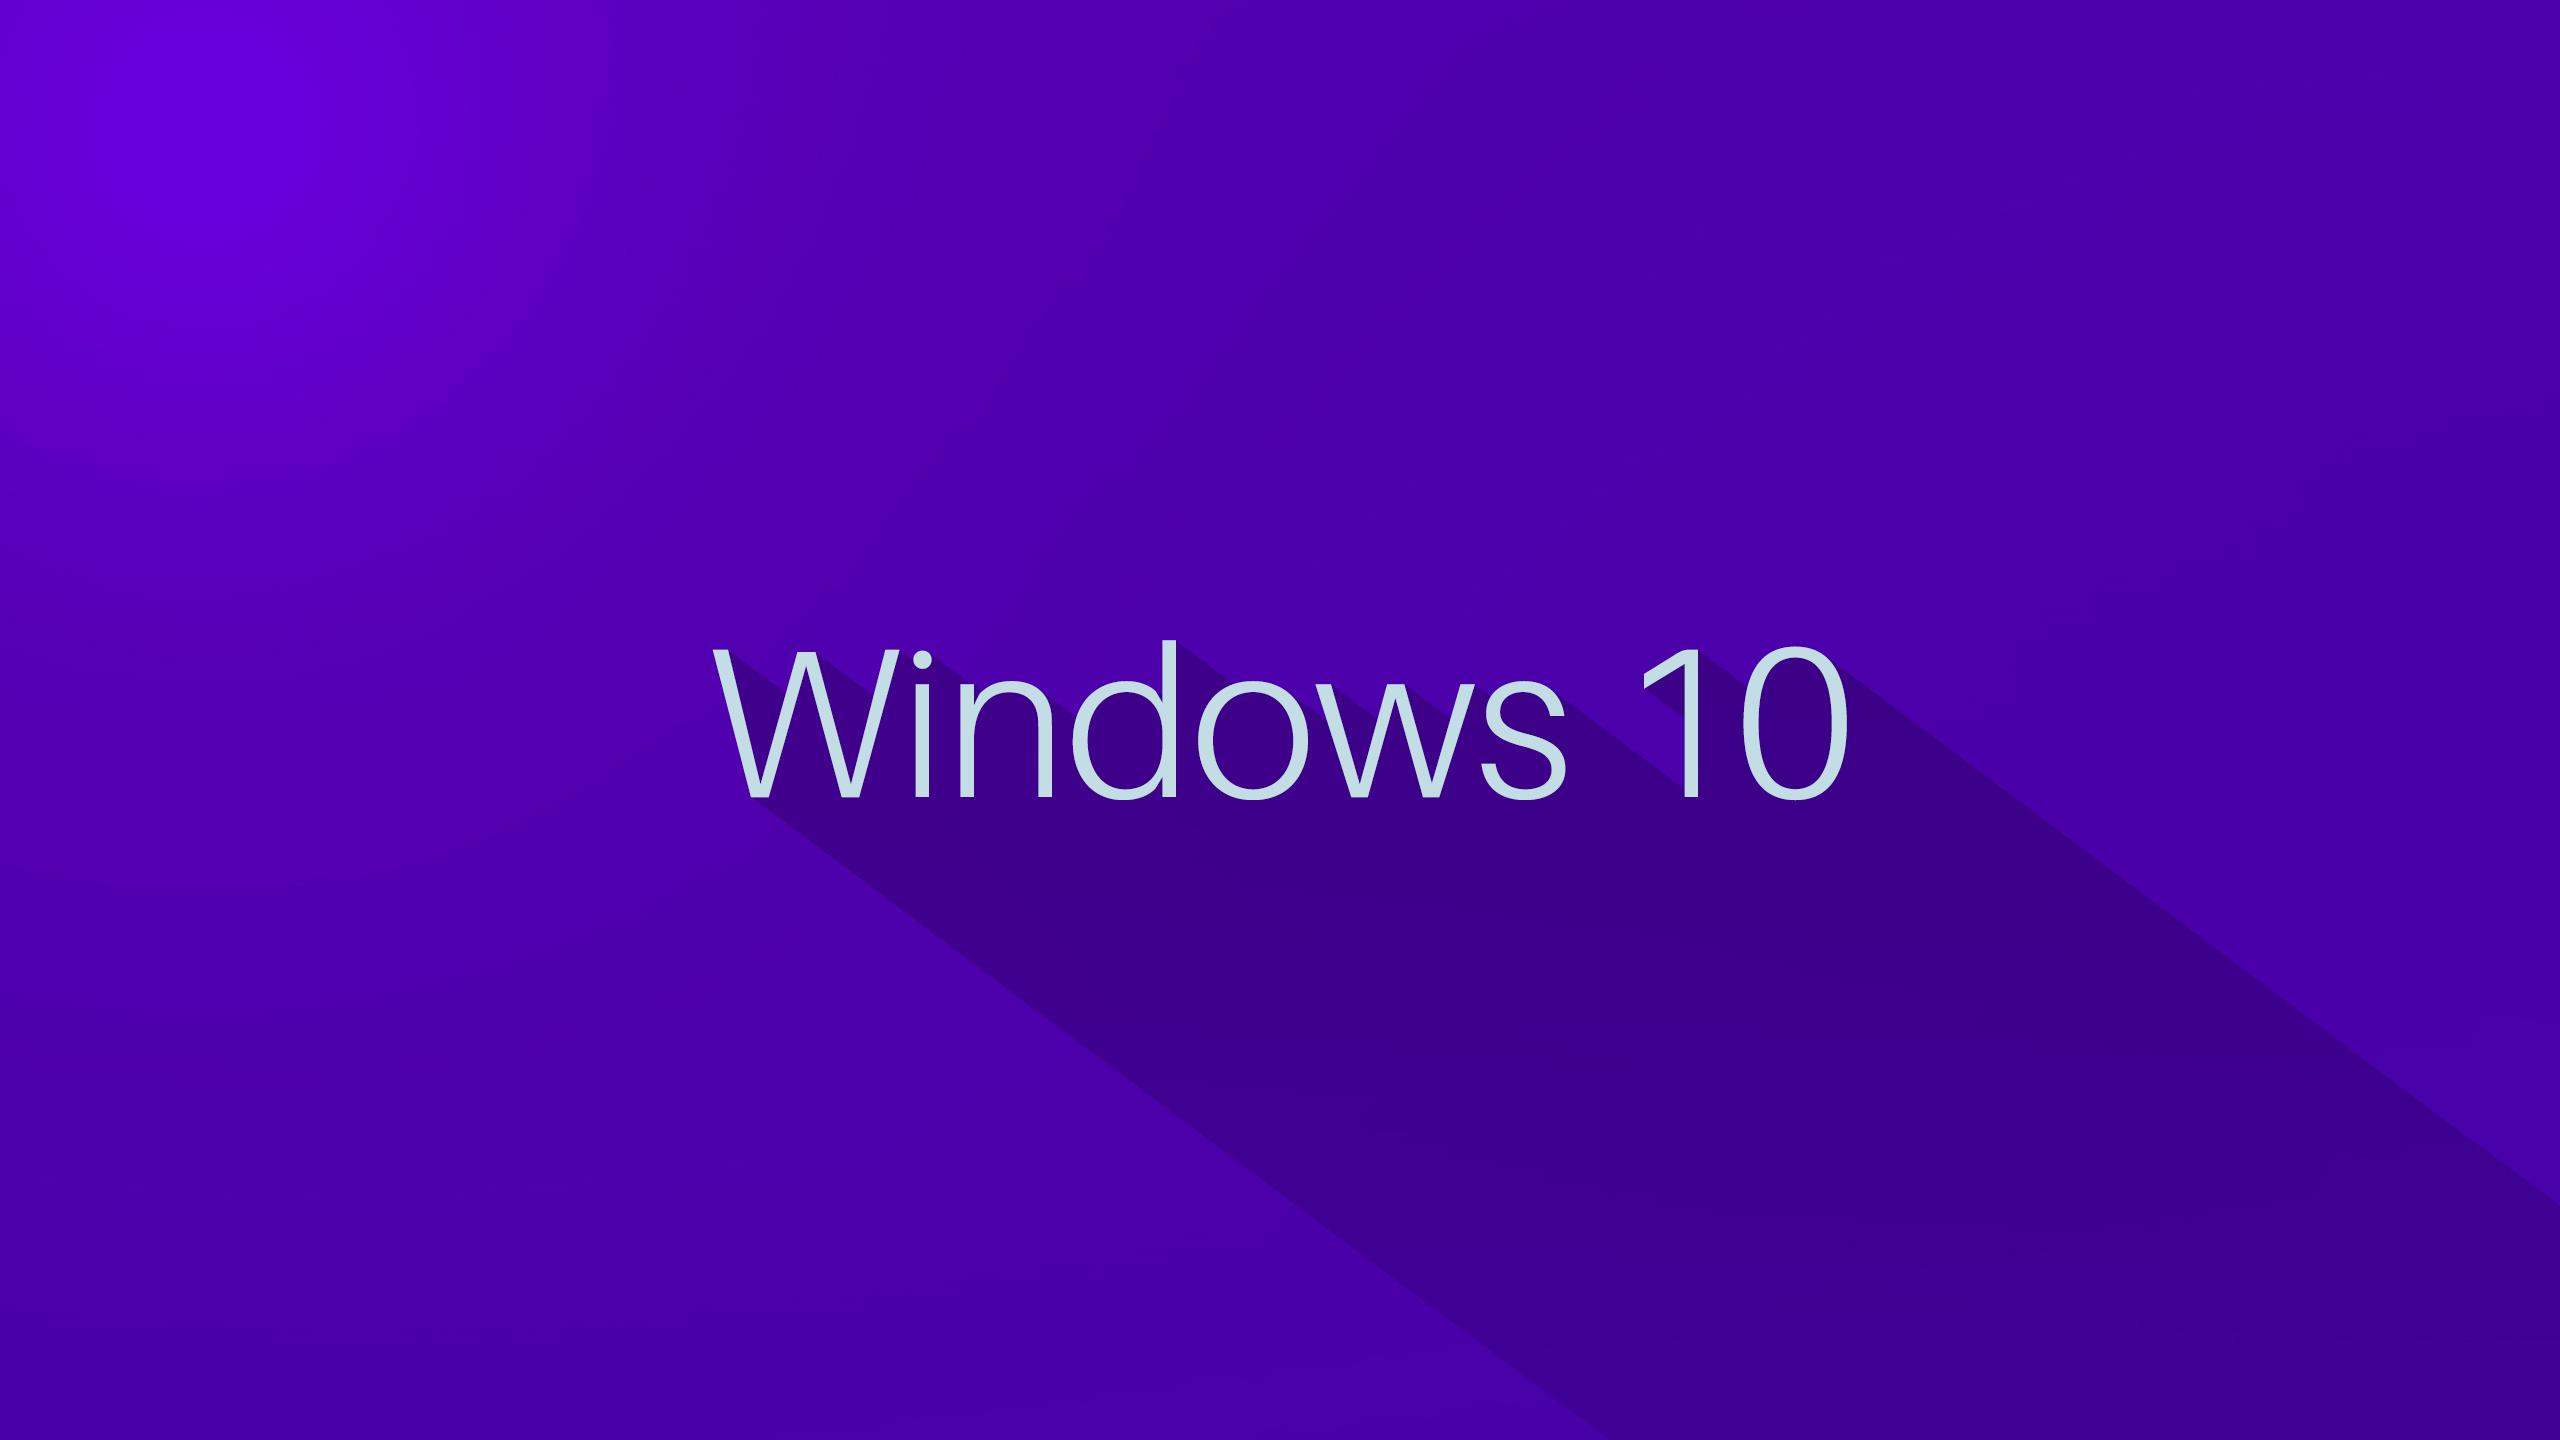 45 Microsoft Desktop Wallpapers Windows 10 On Wallpapersafari